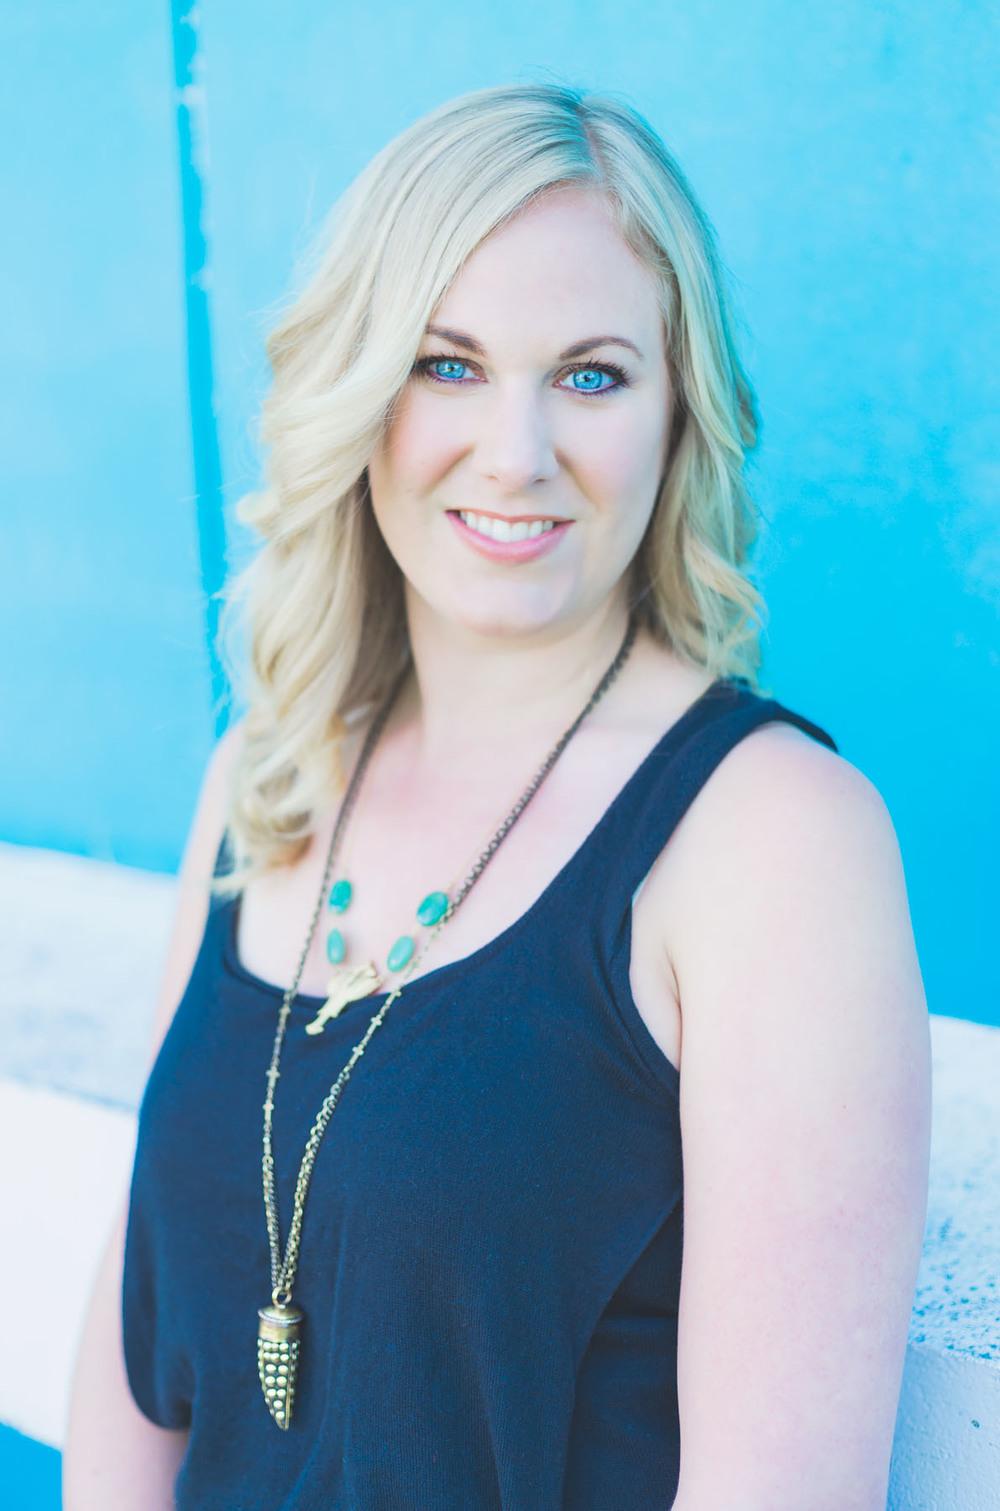 sarah mulder, portrait, jennifer picard photography